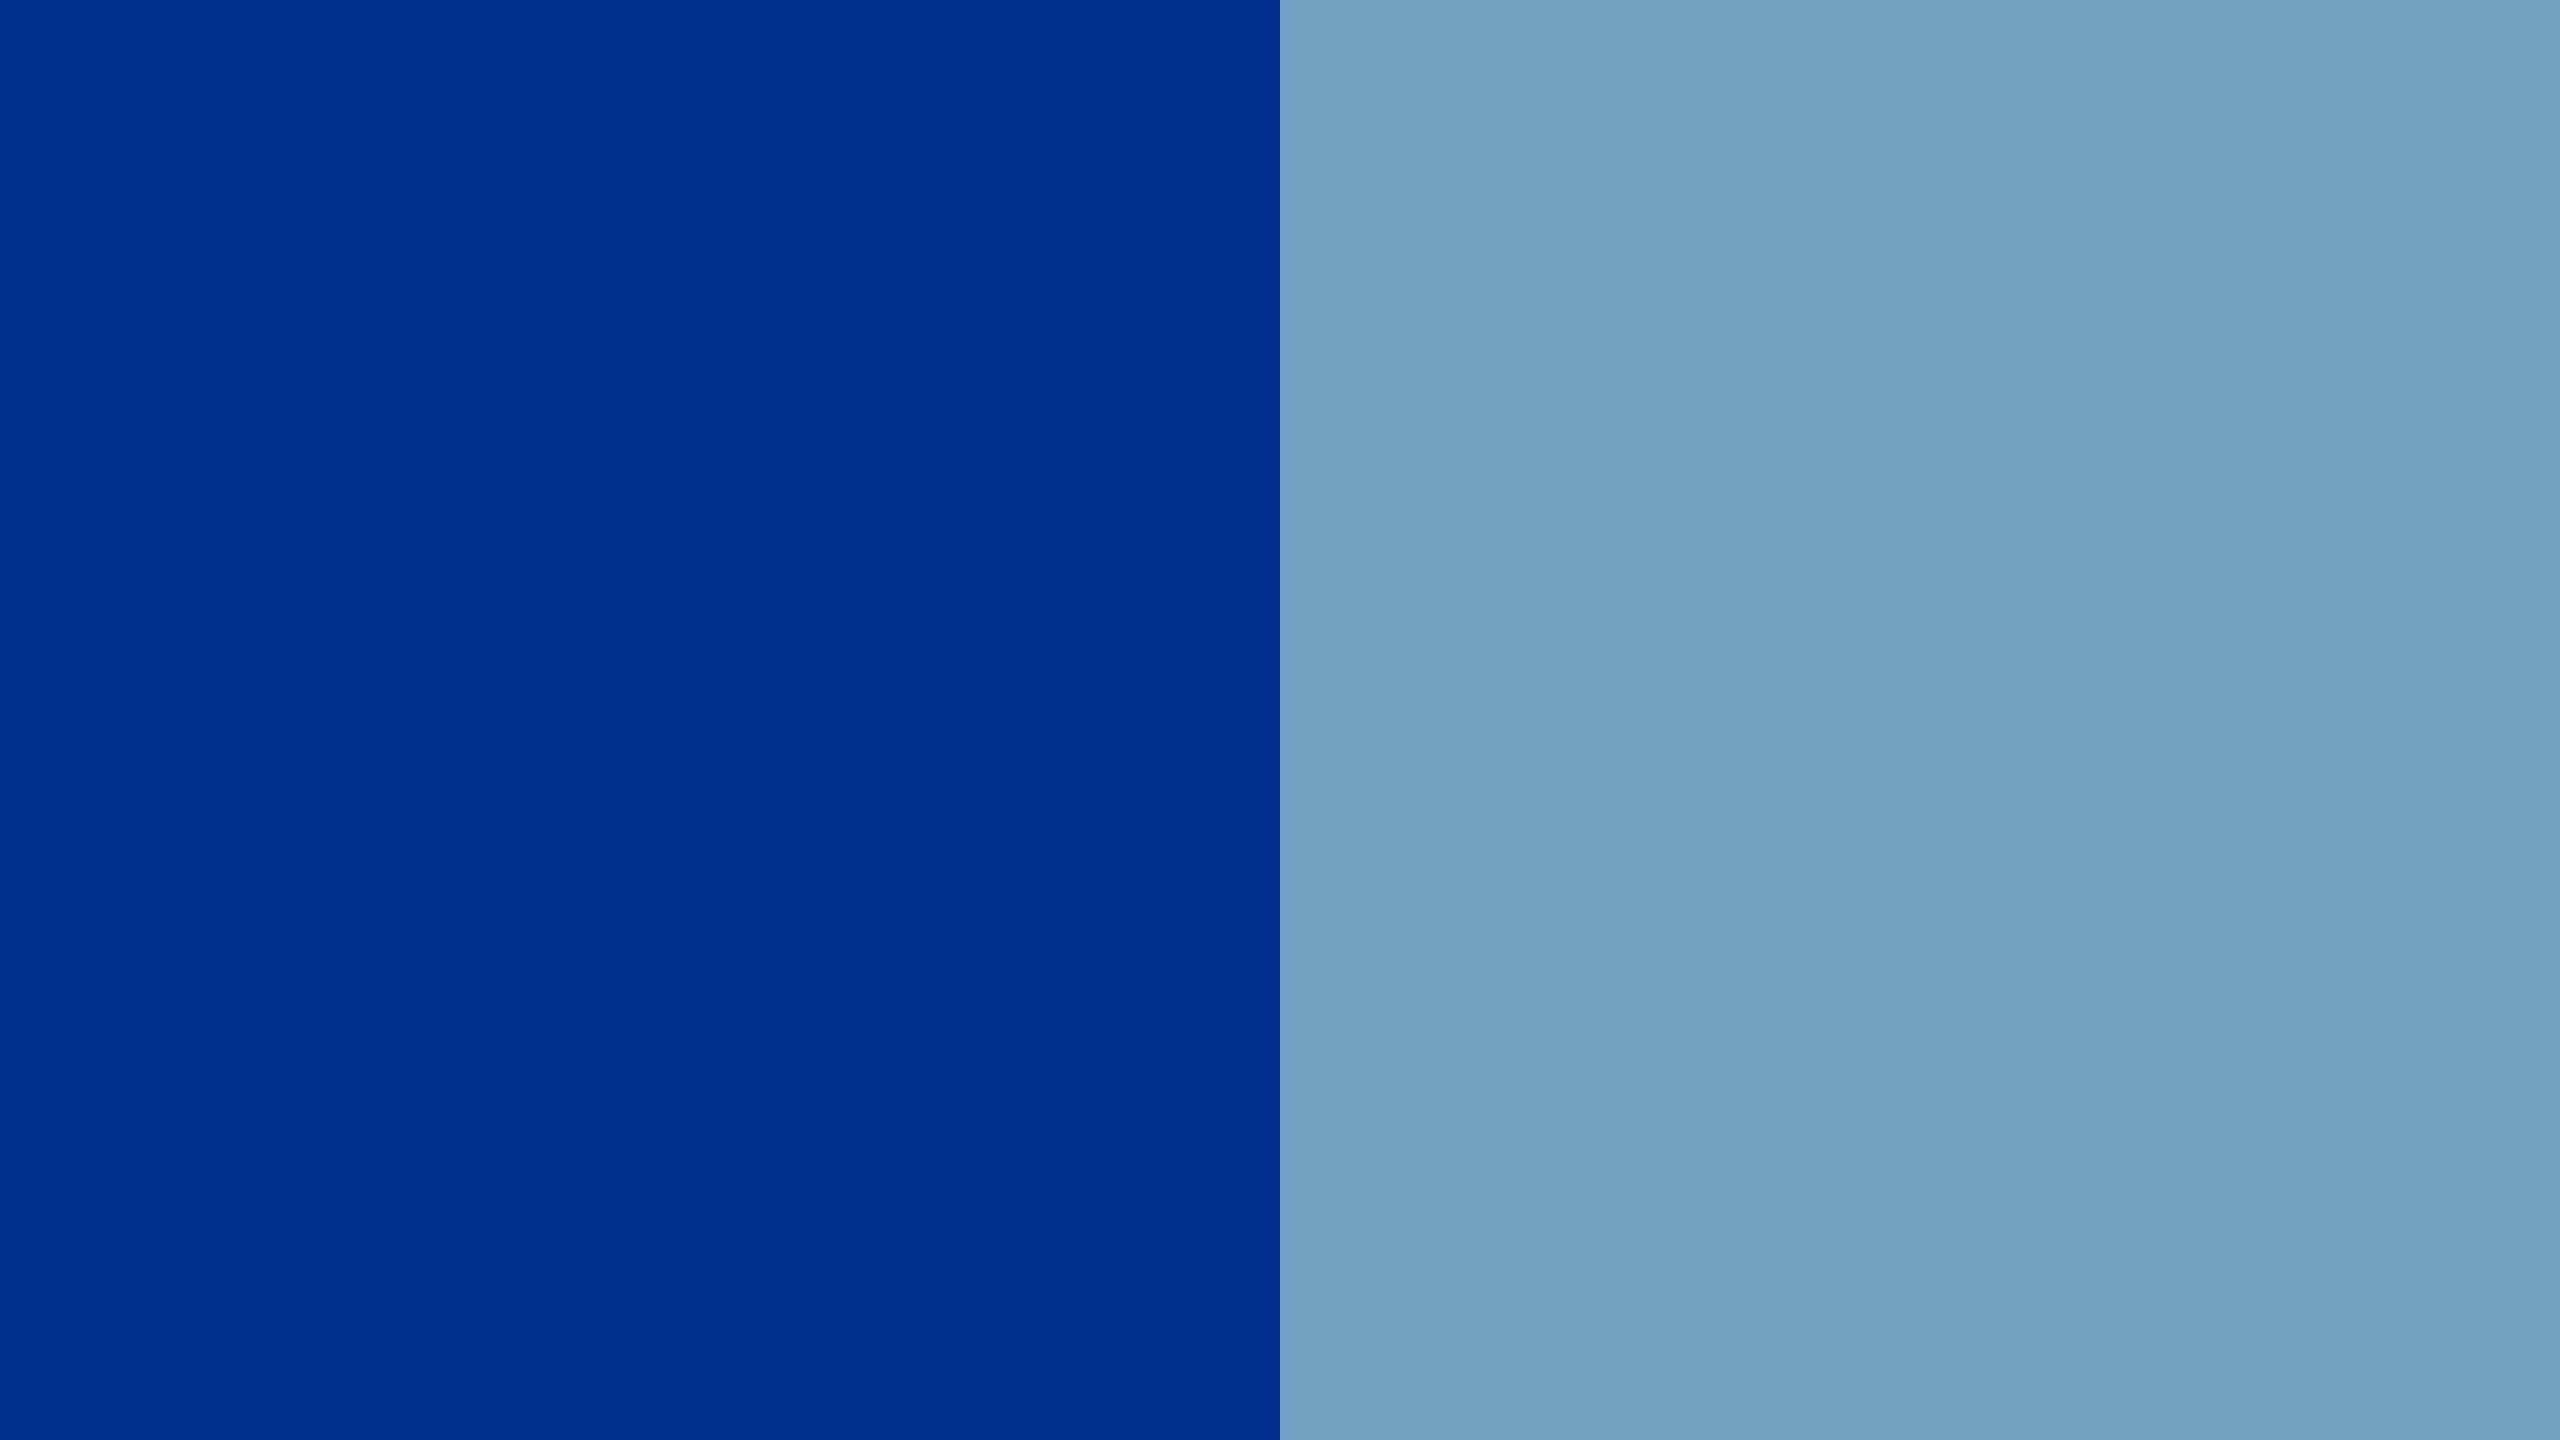 Blue Color Background wallpaper   1062757 2560x1440